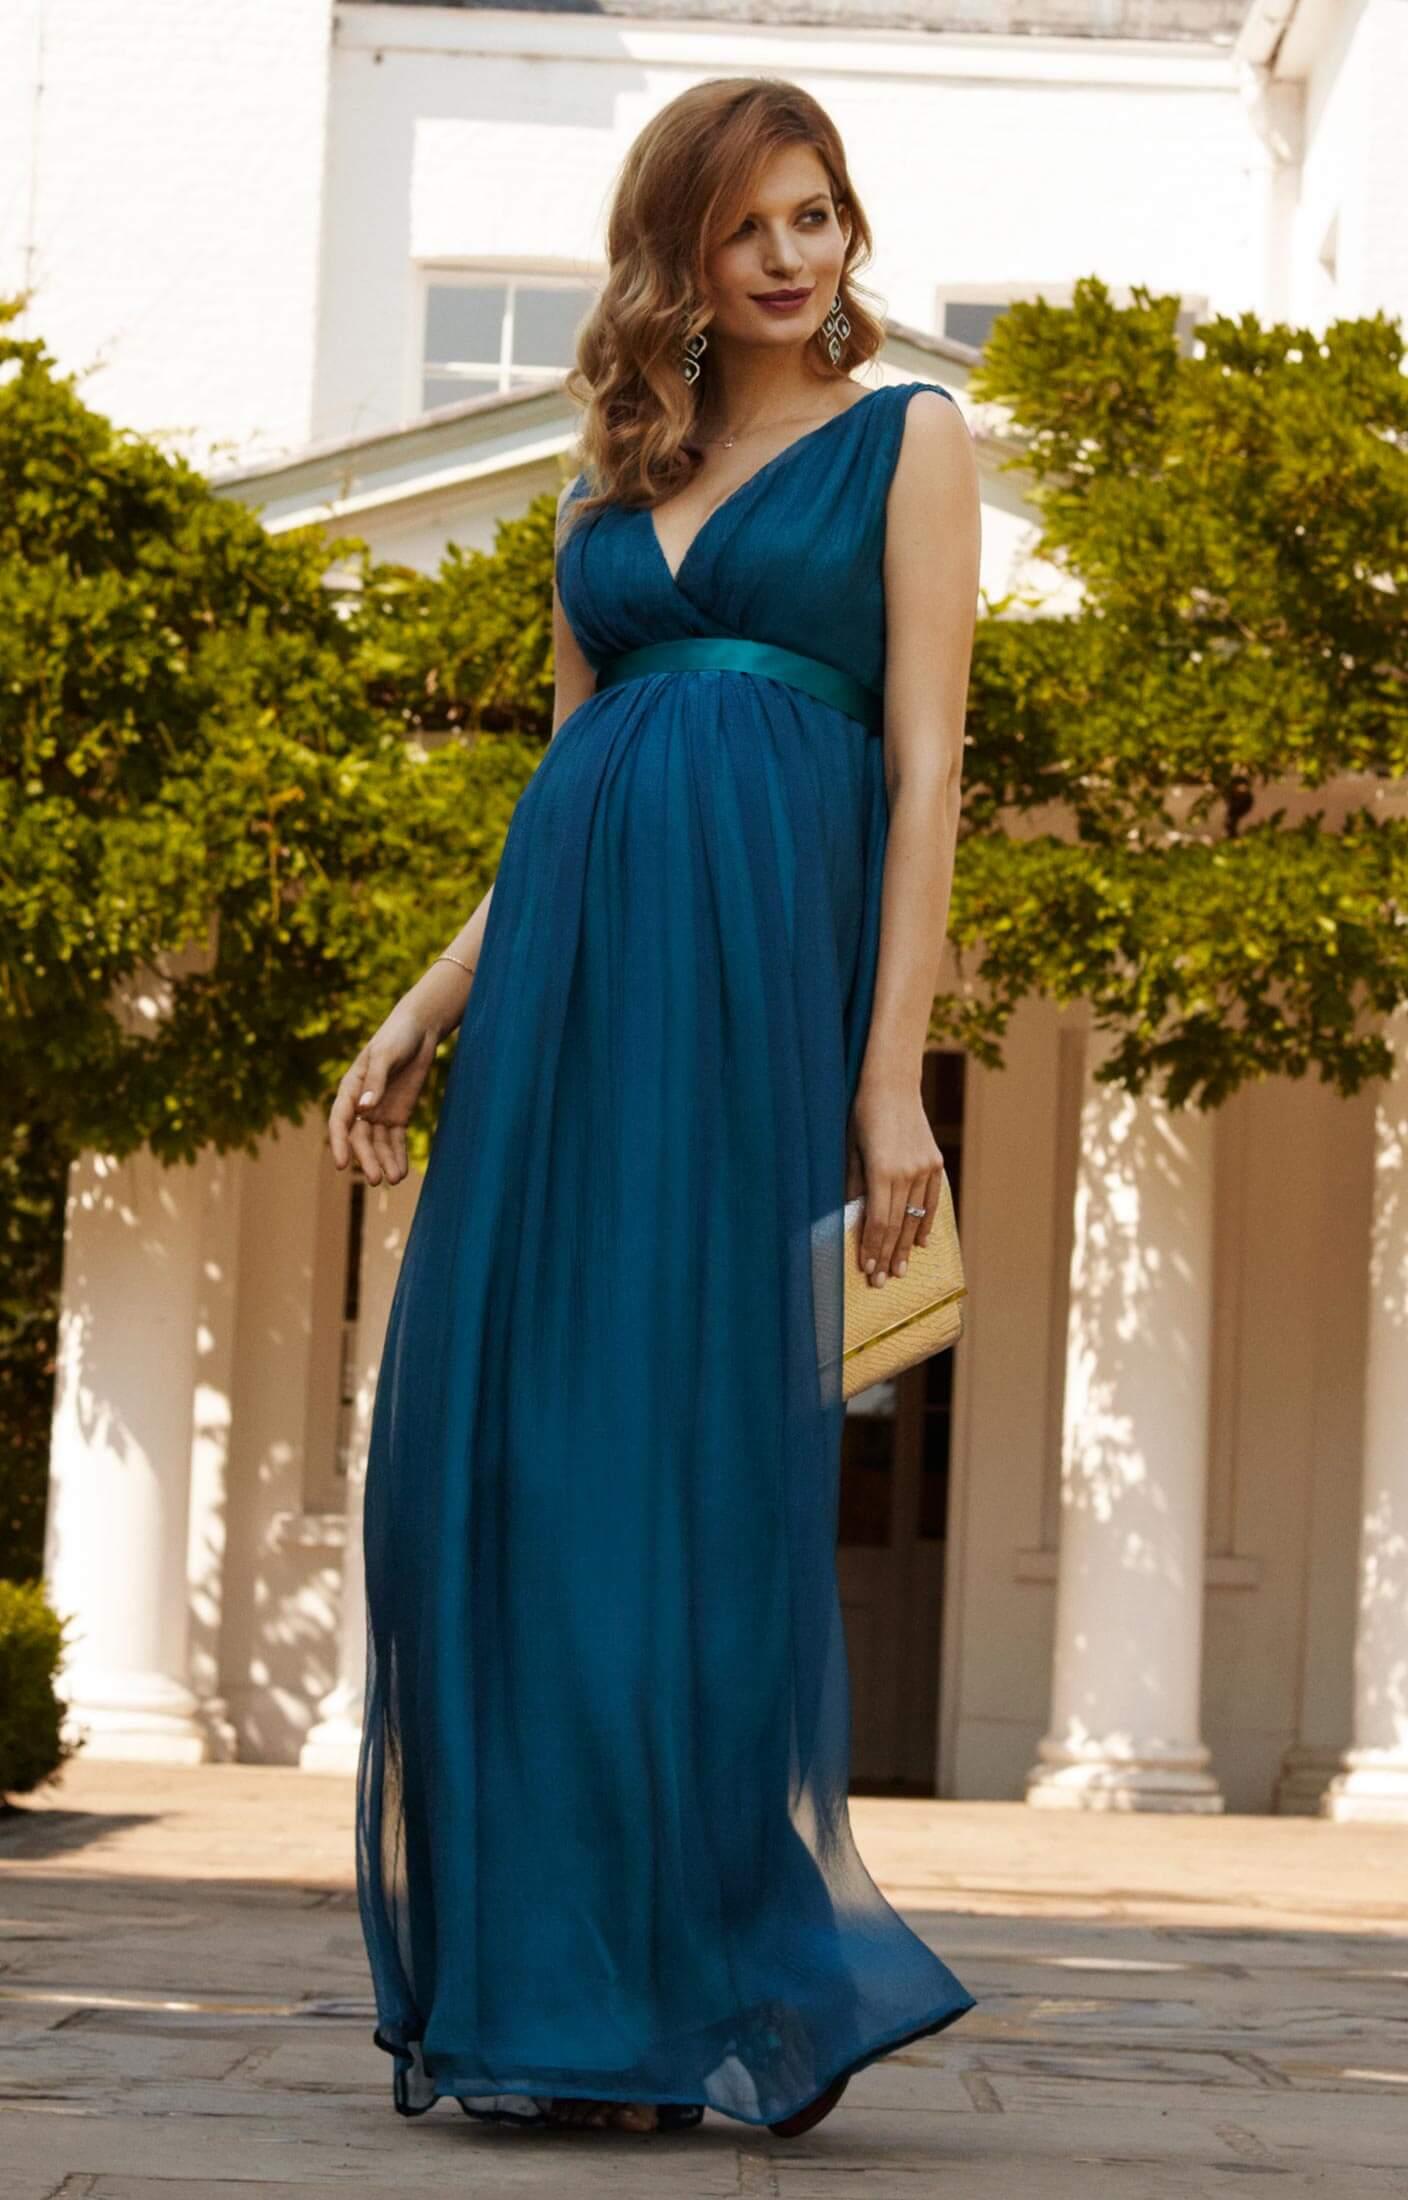 Ava Maternity Gown Long Aegean Blue  Maternity Wedding